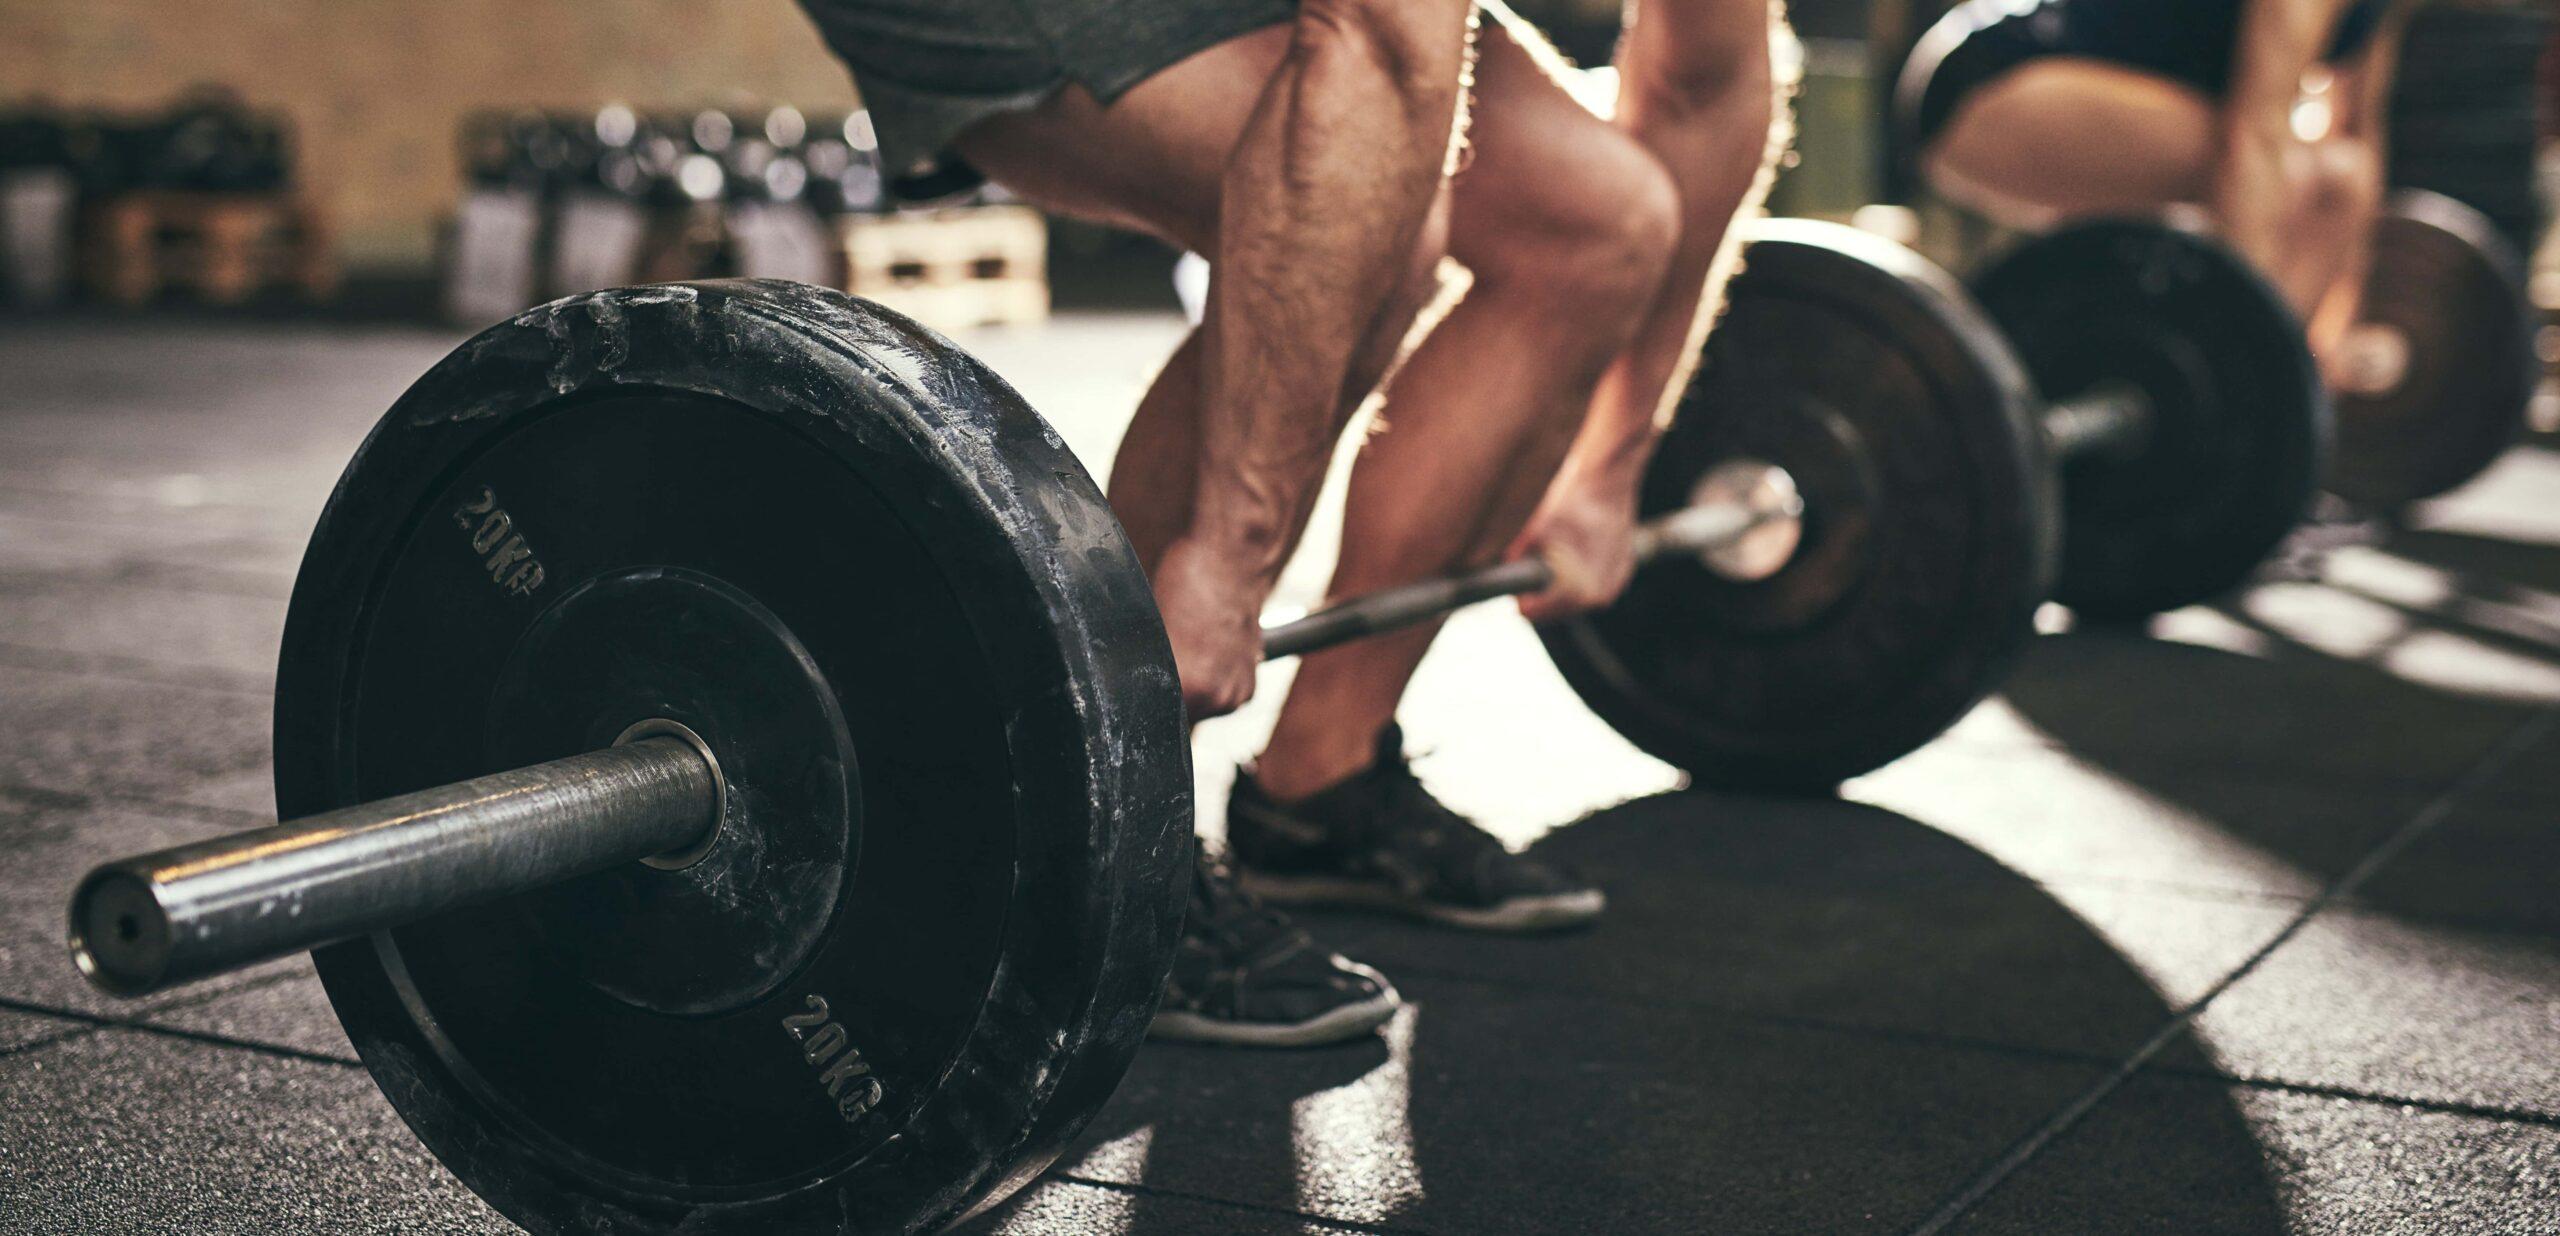 stacchi a gambe tese bodybuilding